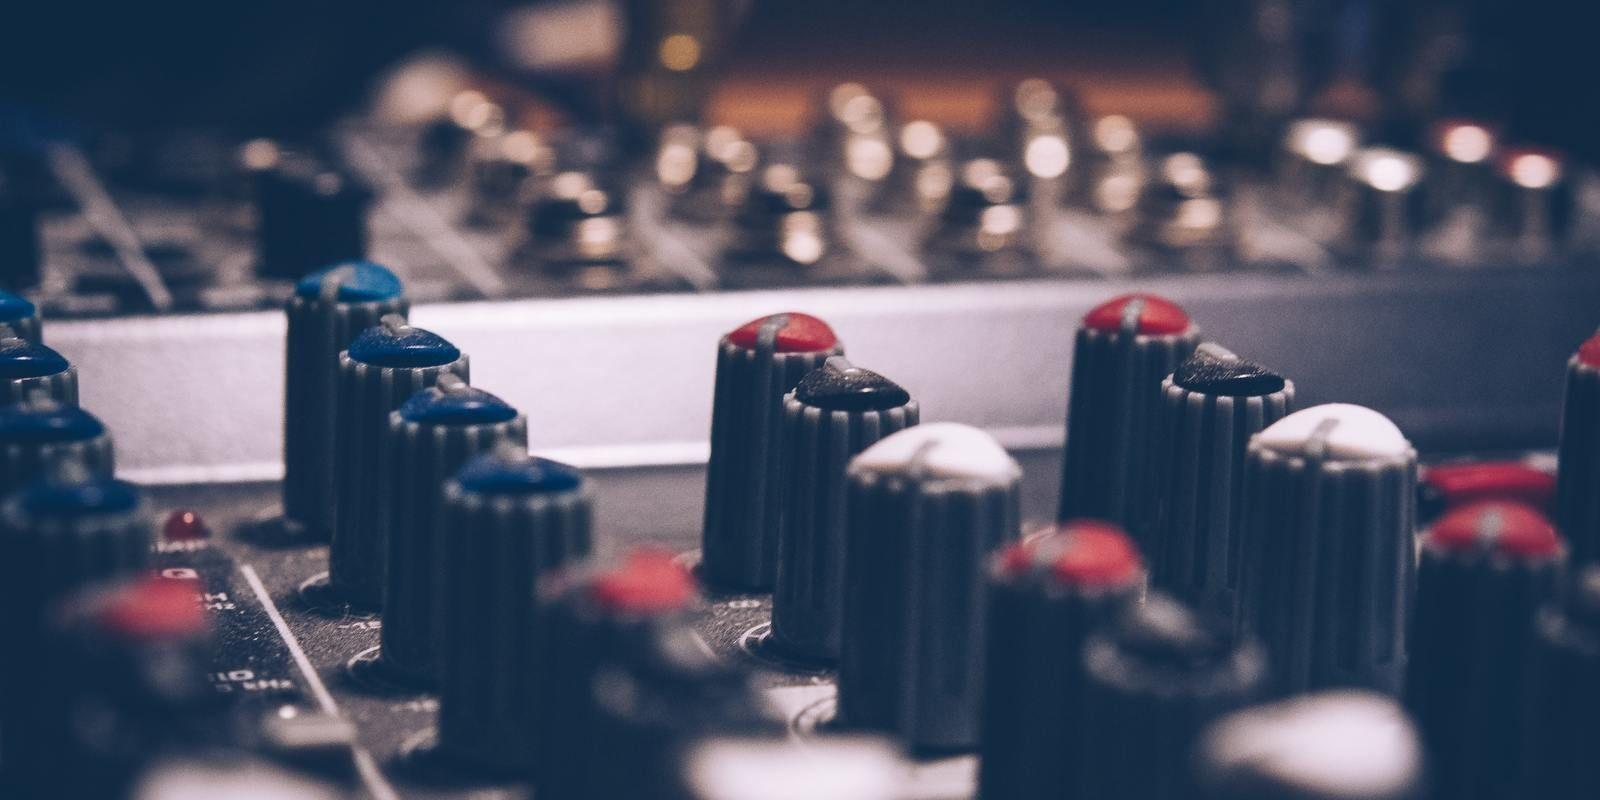 1532008104 34 amplifier analogue audio 744318